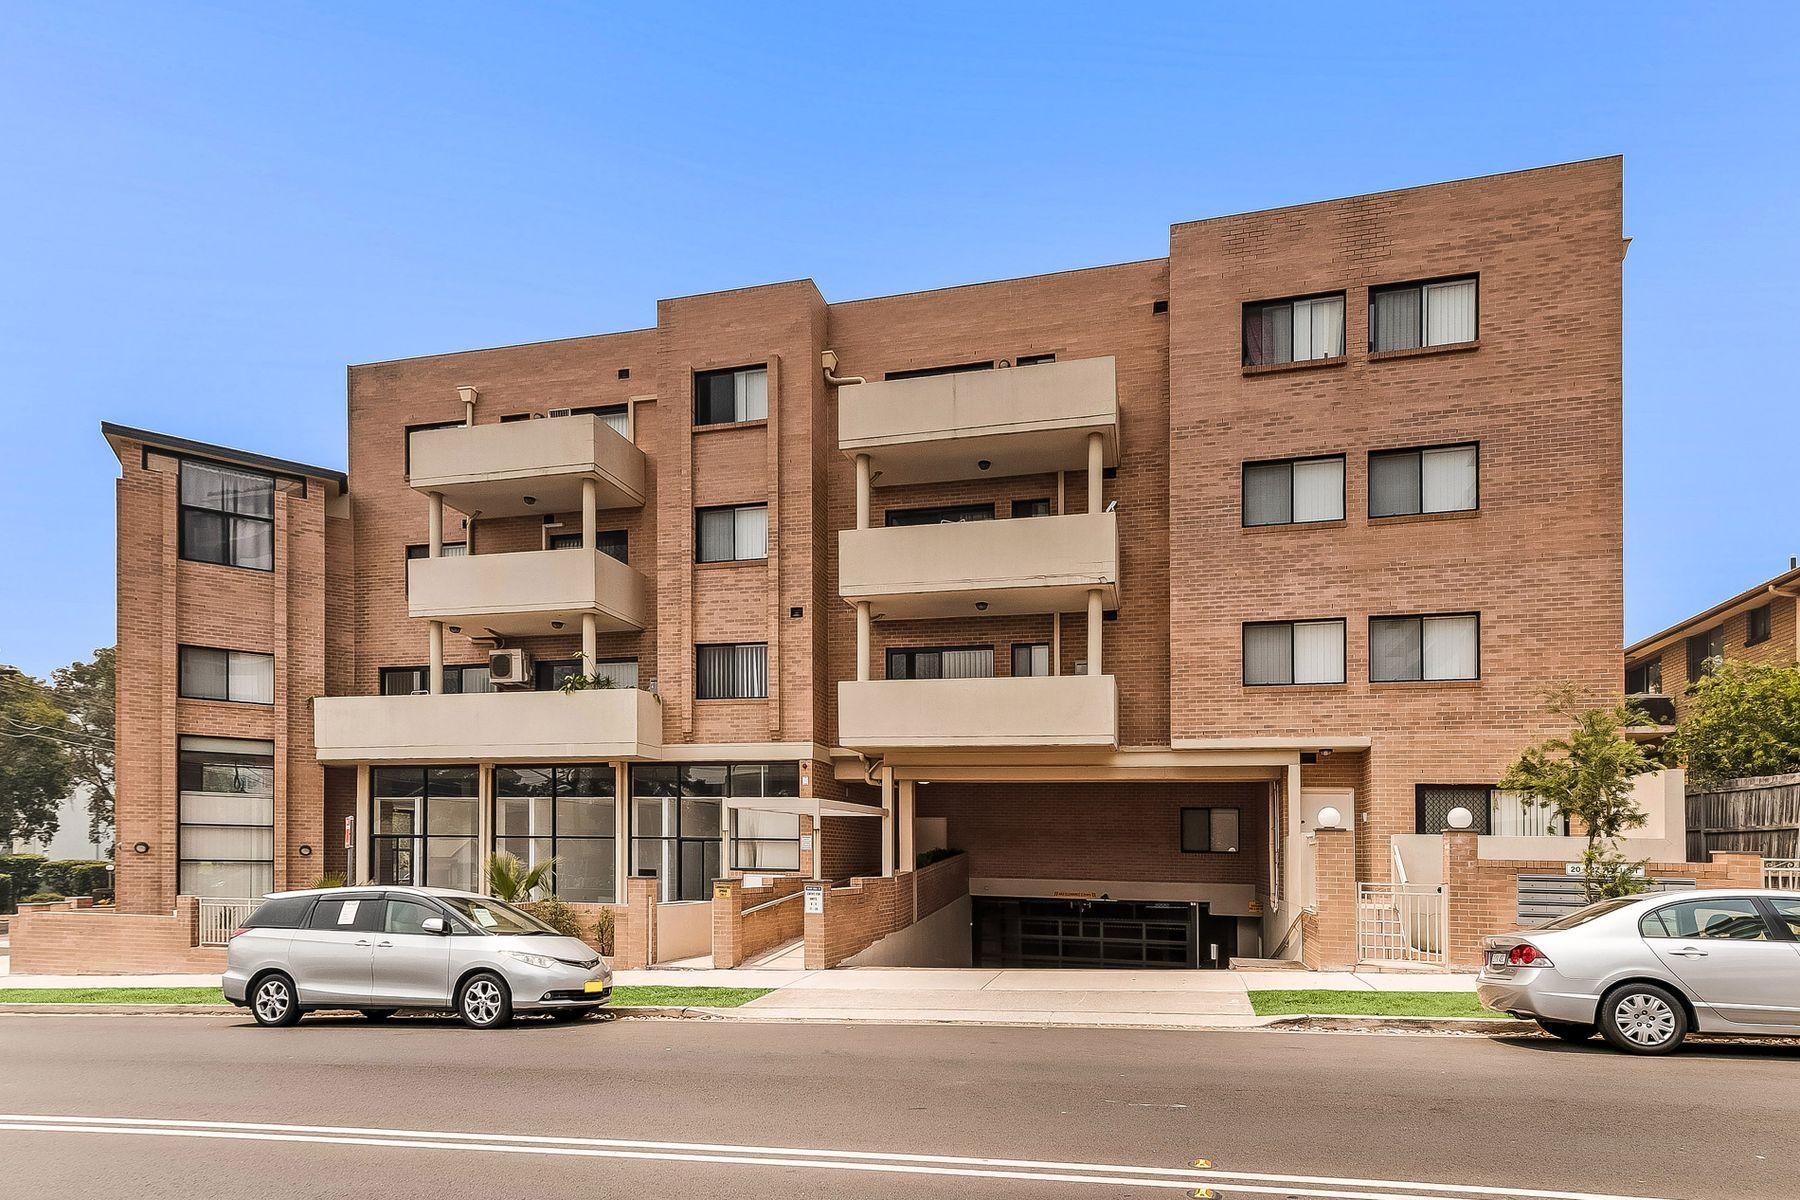 19/20-22 Hall Street, Auburn, NSW 2144